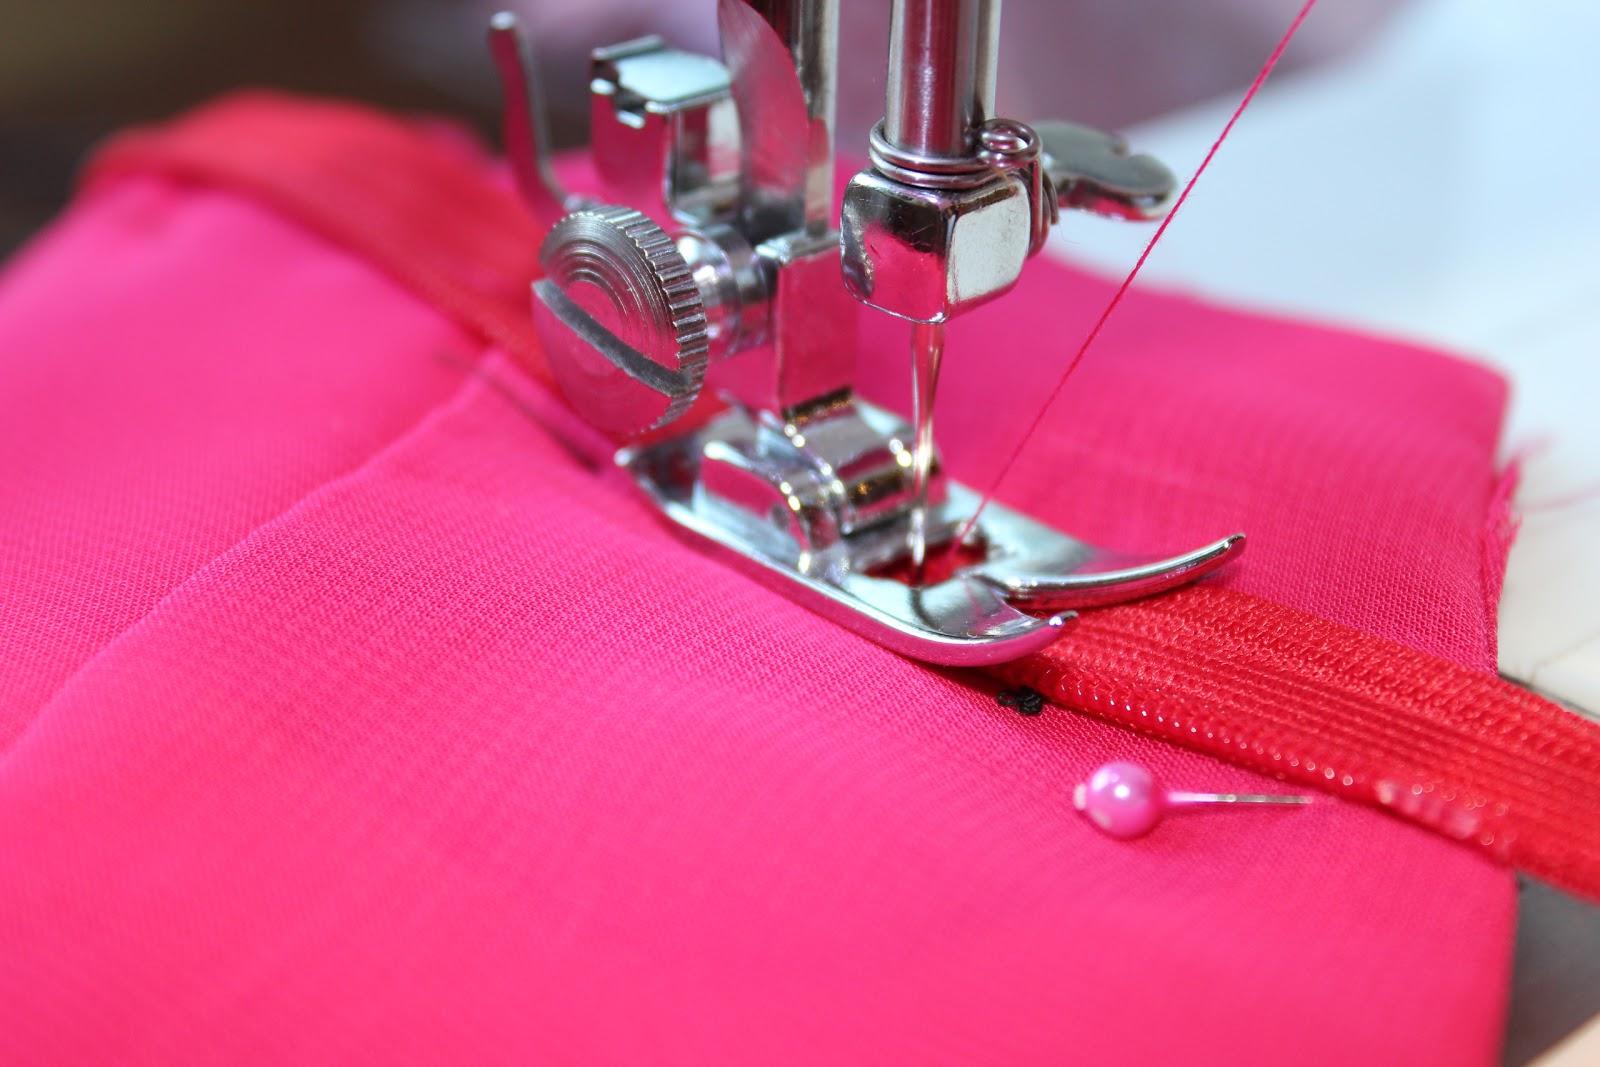 Aprender a coser a máquina desde cero patatero :D | | Oh